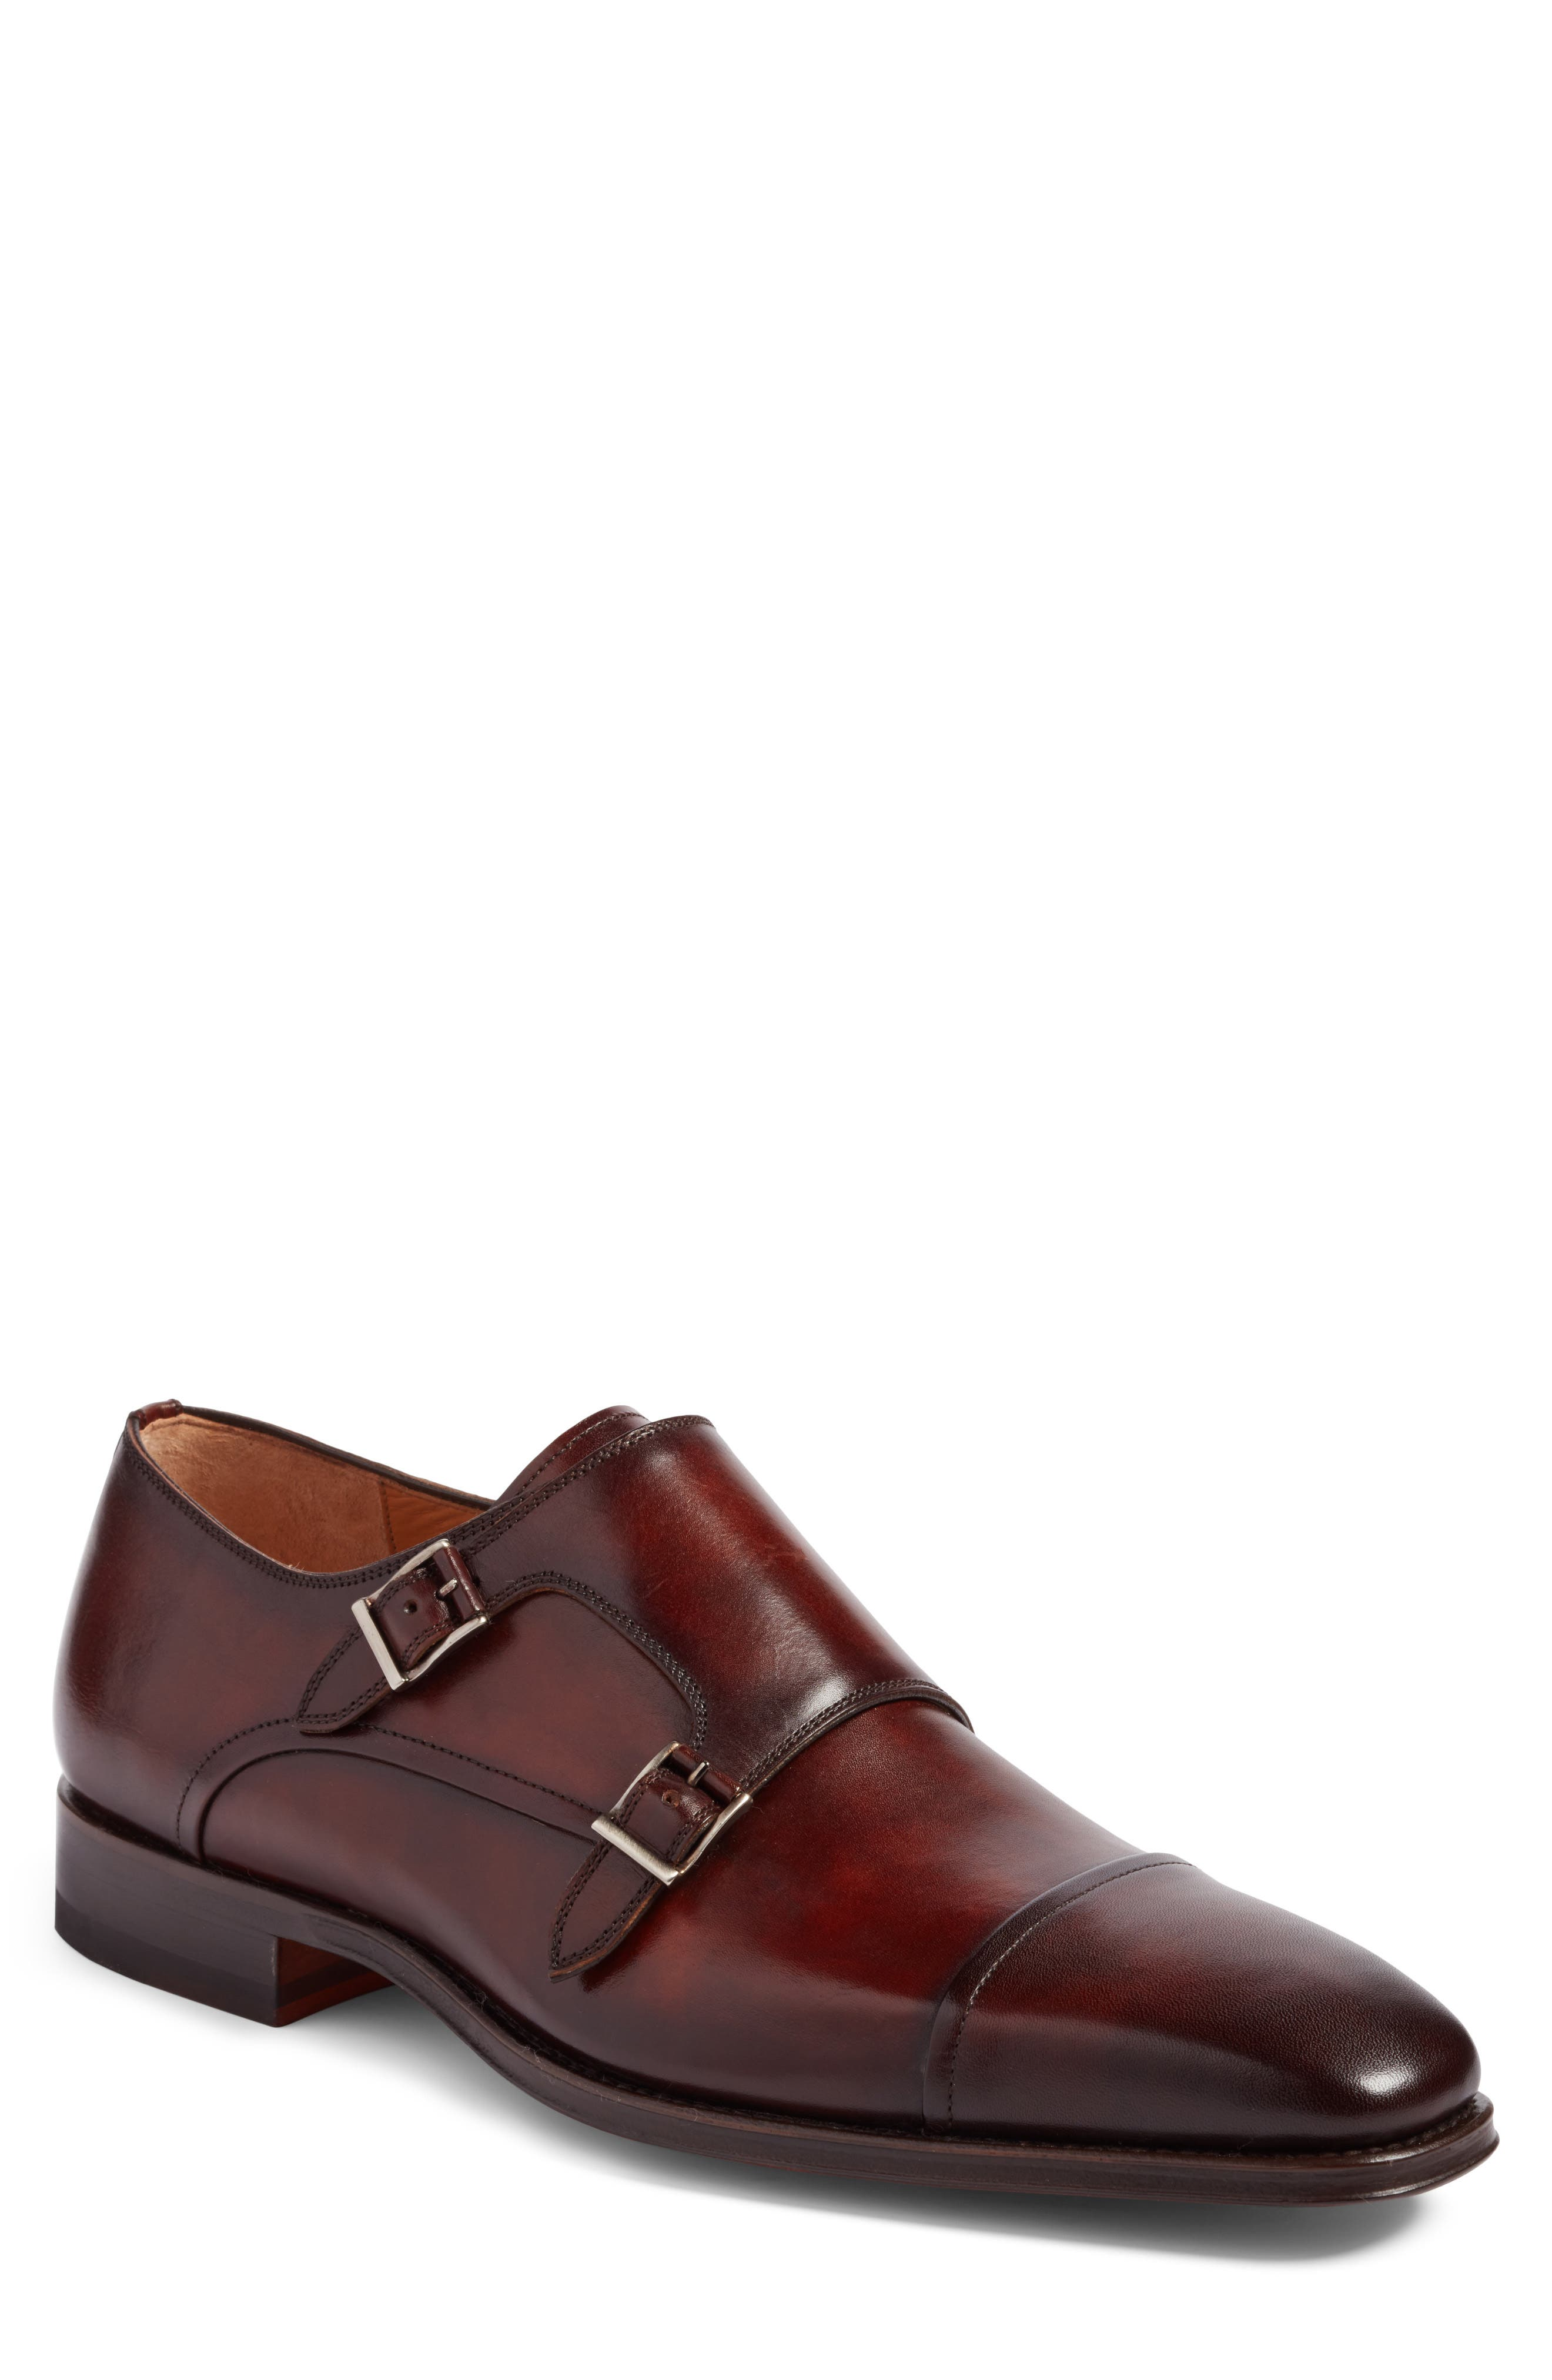 Alternate Image 1 Selected - Magnanni Silvio Double Monk Strap Shoe (Men)